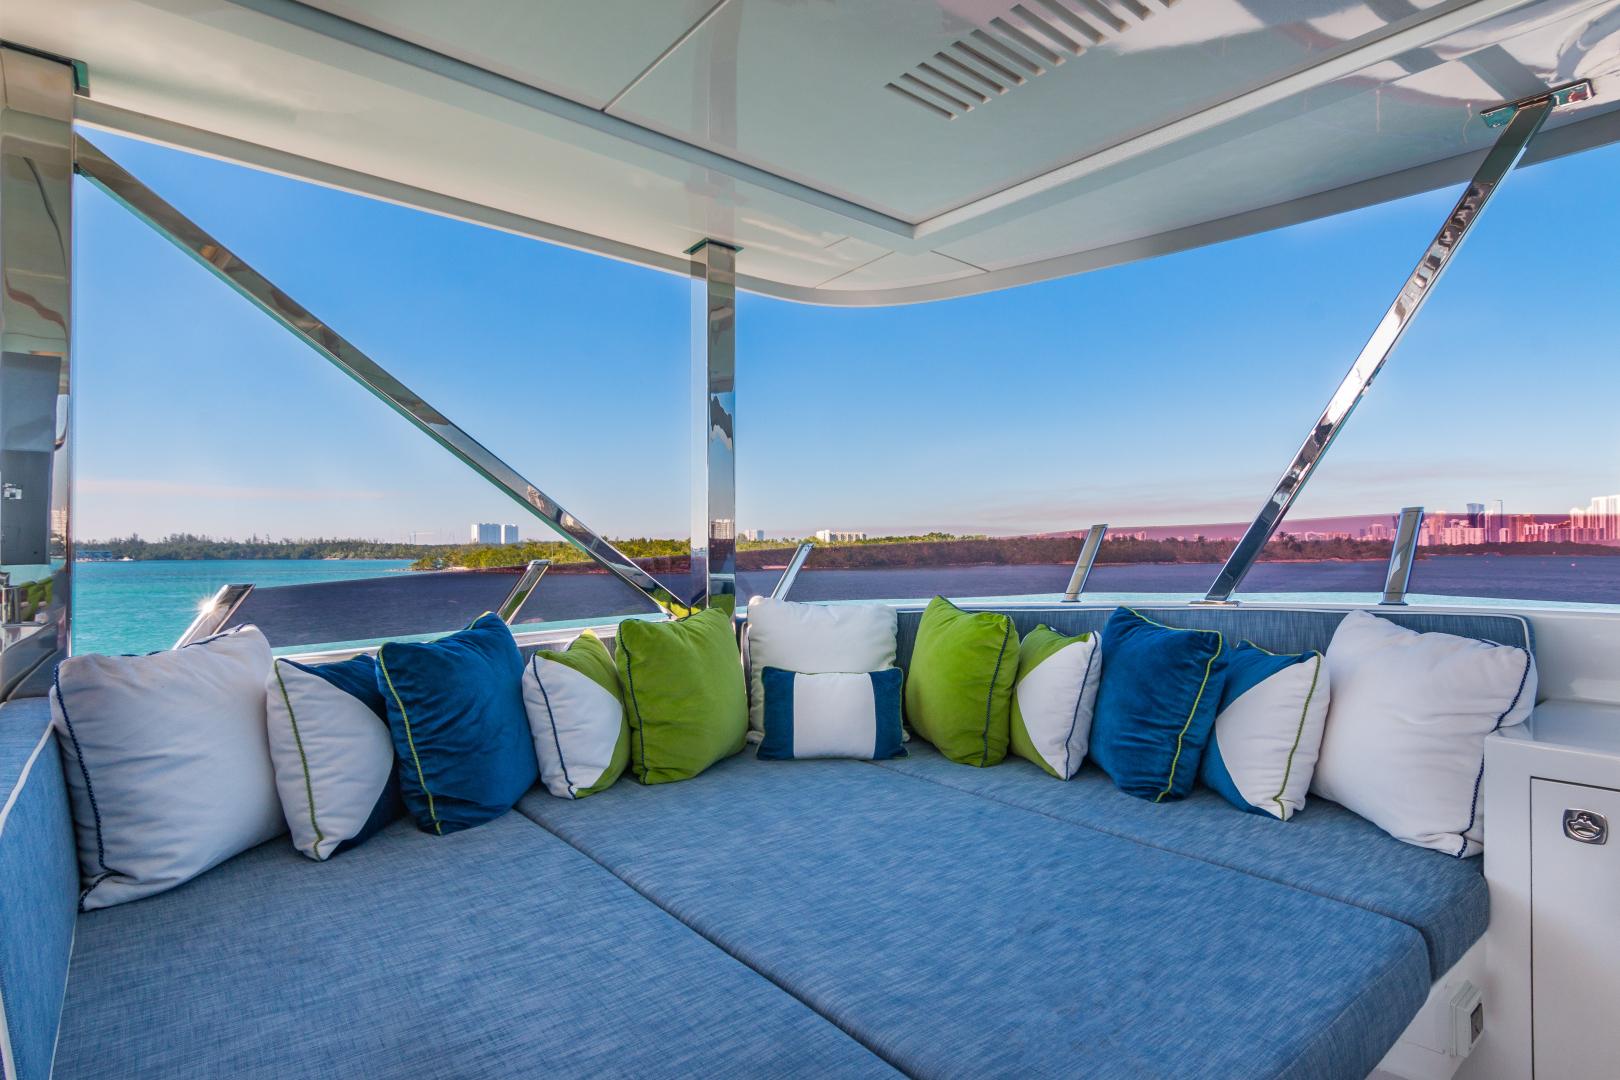 Vicem-Raised Pilot House 2013-MONI FORT LAUDERDALE-Florida-United States-SUN DECK LOUNGING-1394886 | Thumbnail